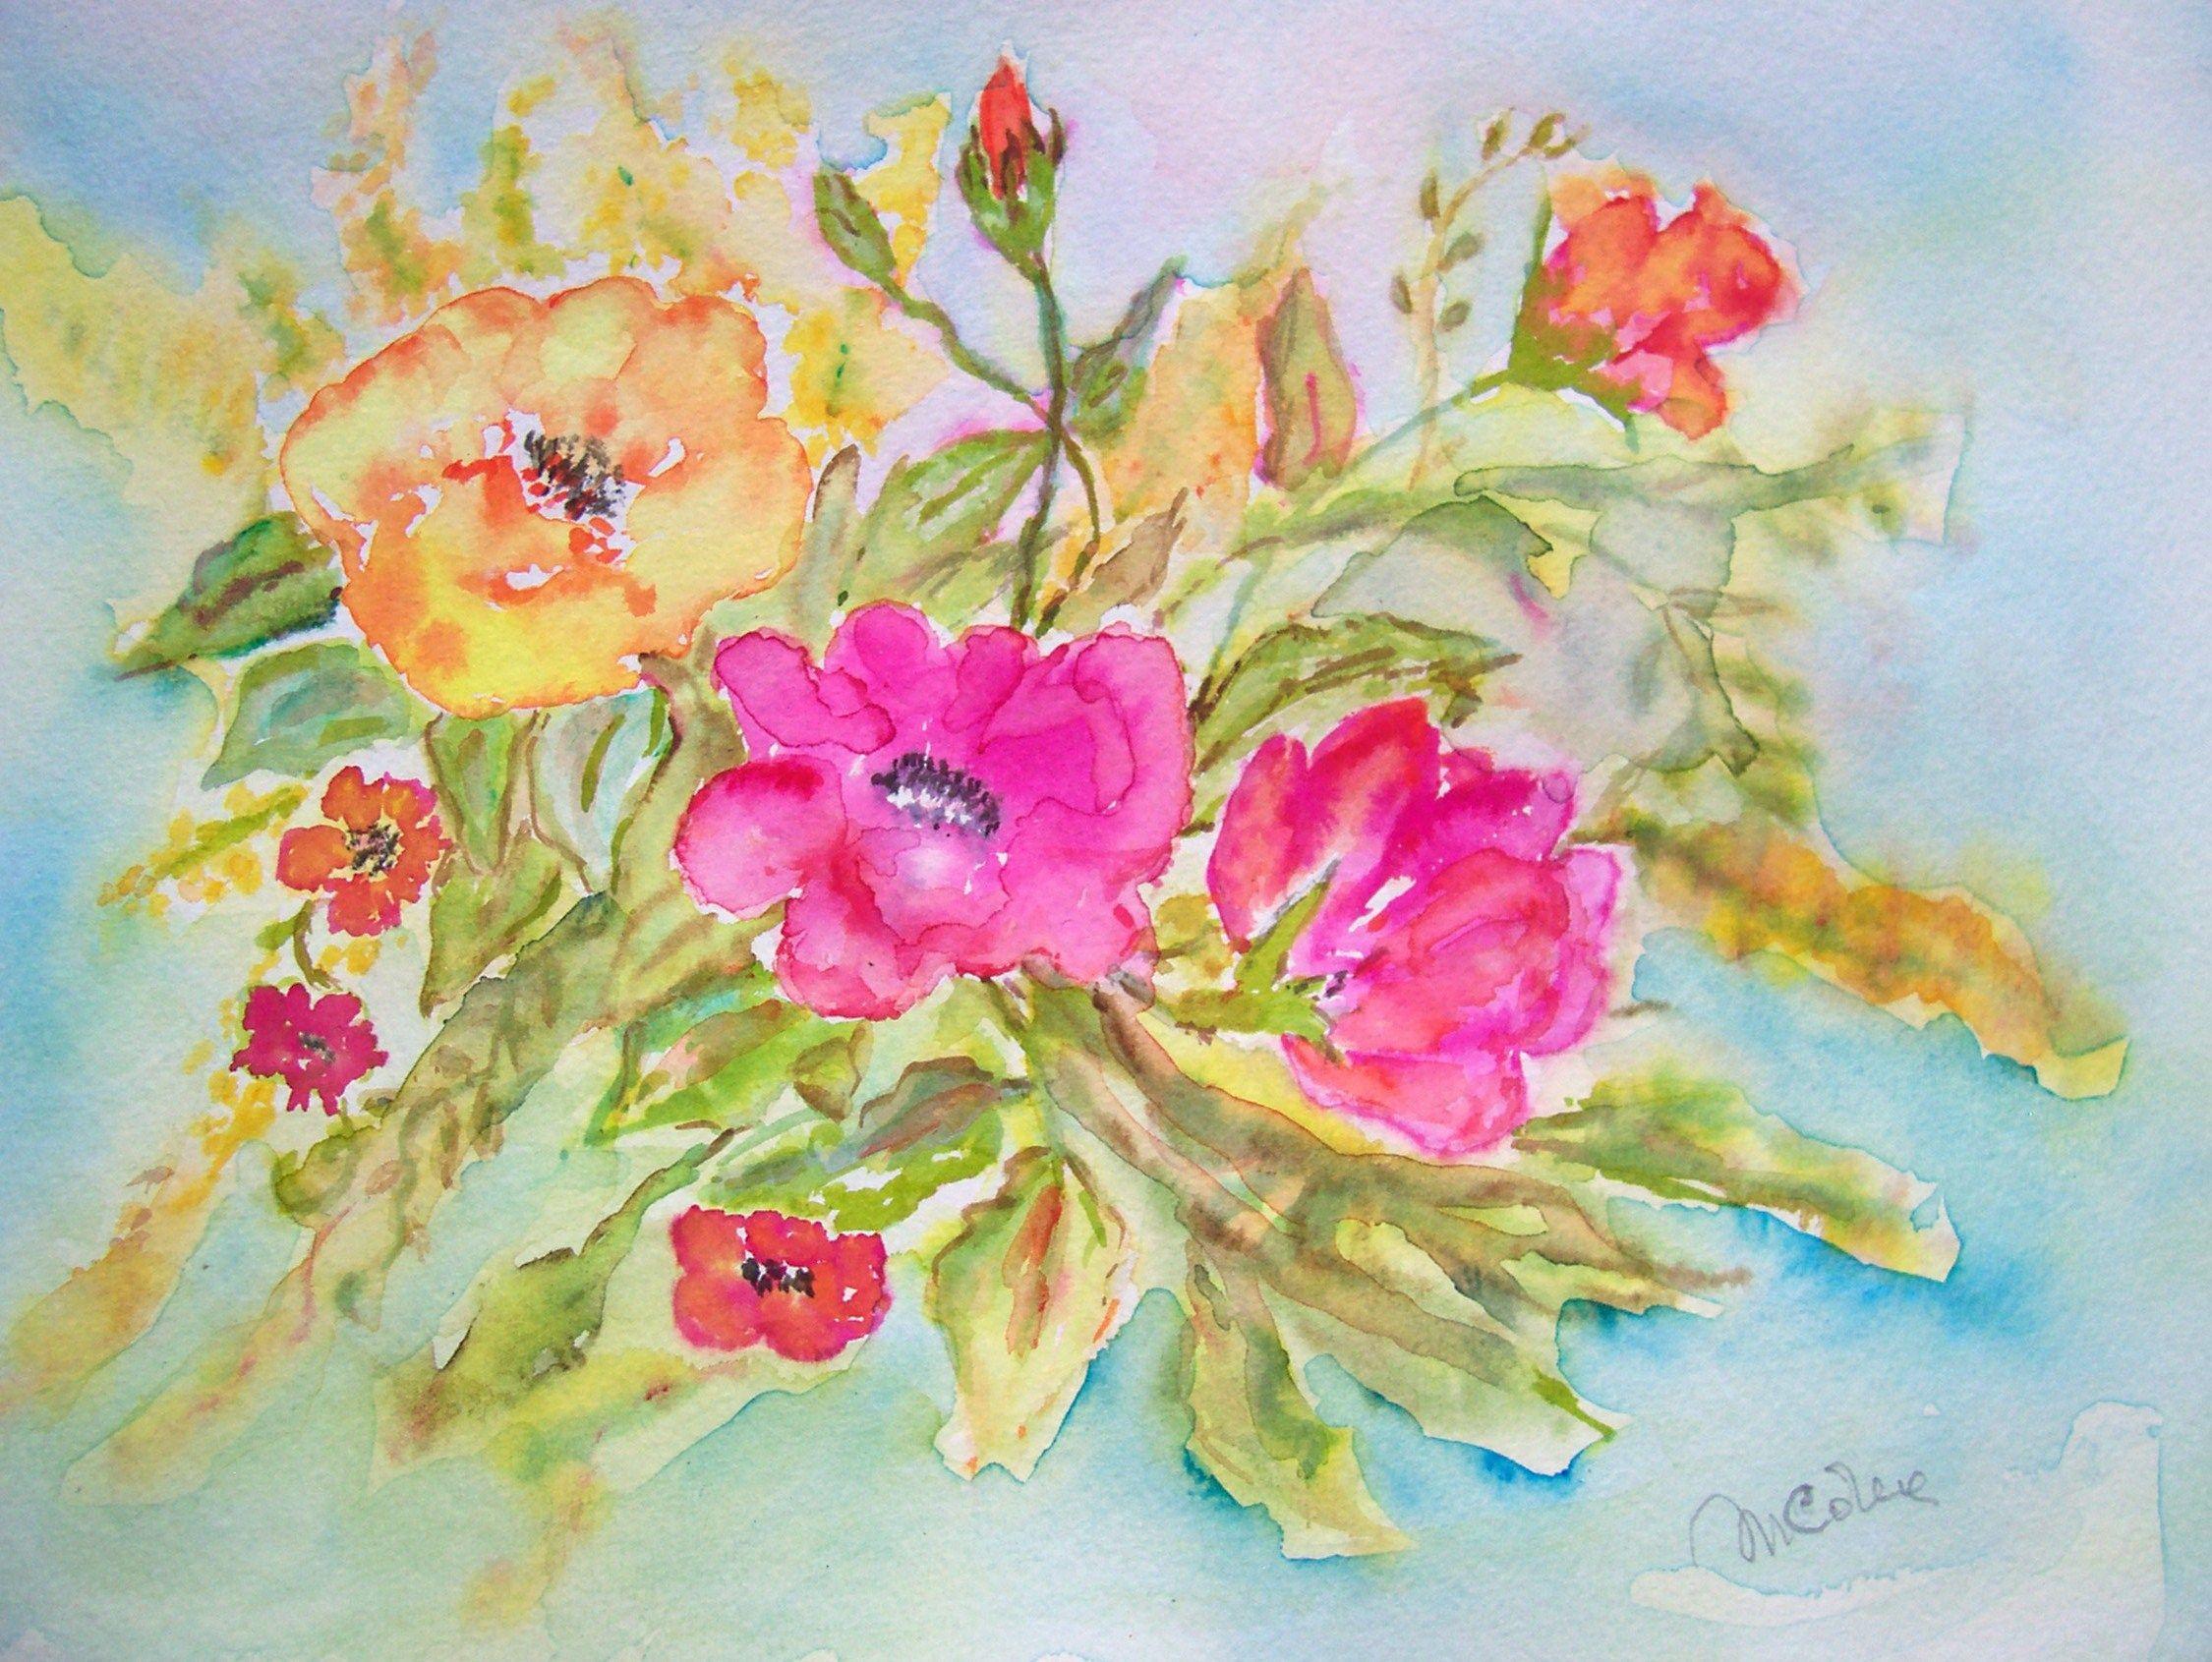 """Primavera"" formato A4- watercolor by Macridea"